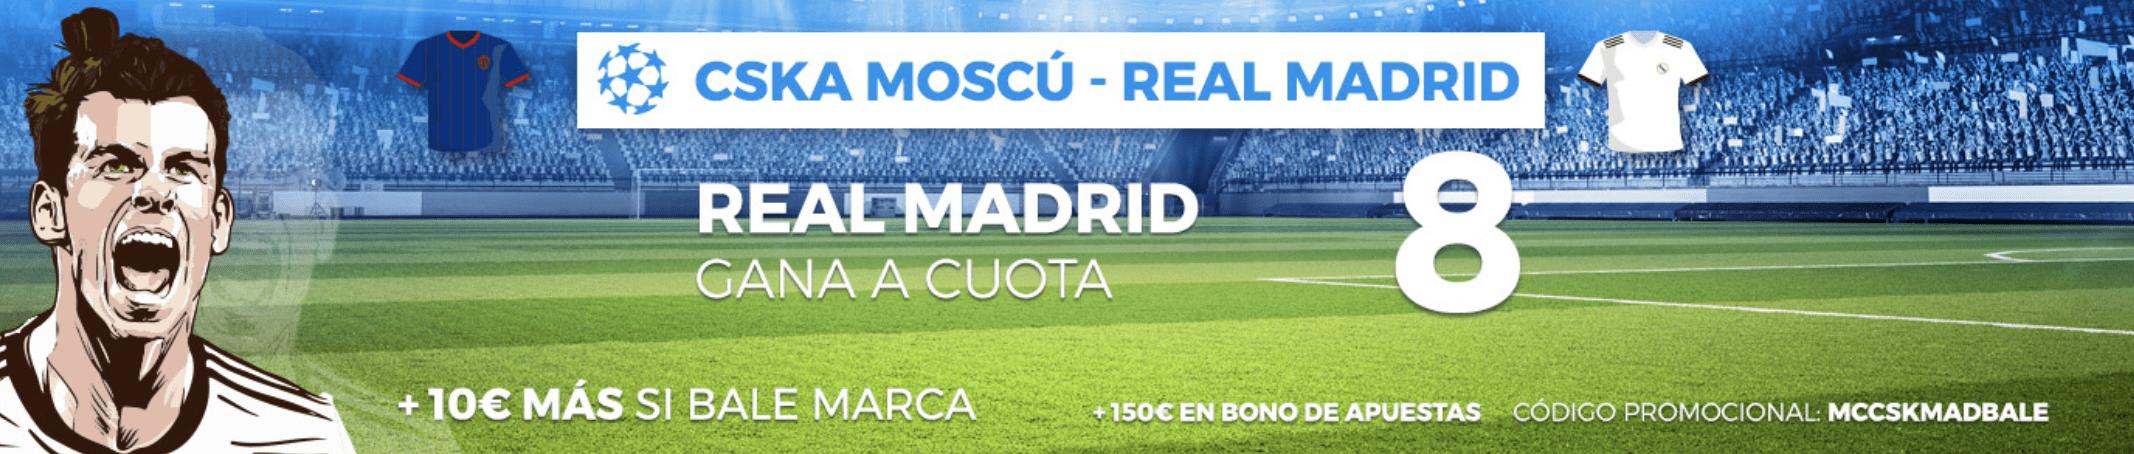 Supercuotas Pastón Champions League CSKA - Real Madrid